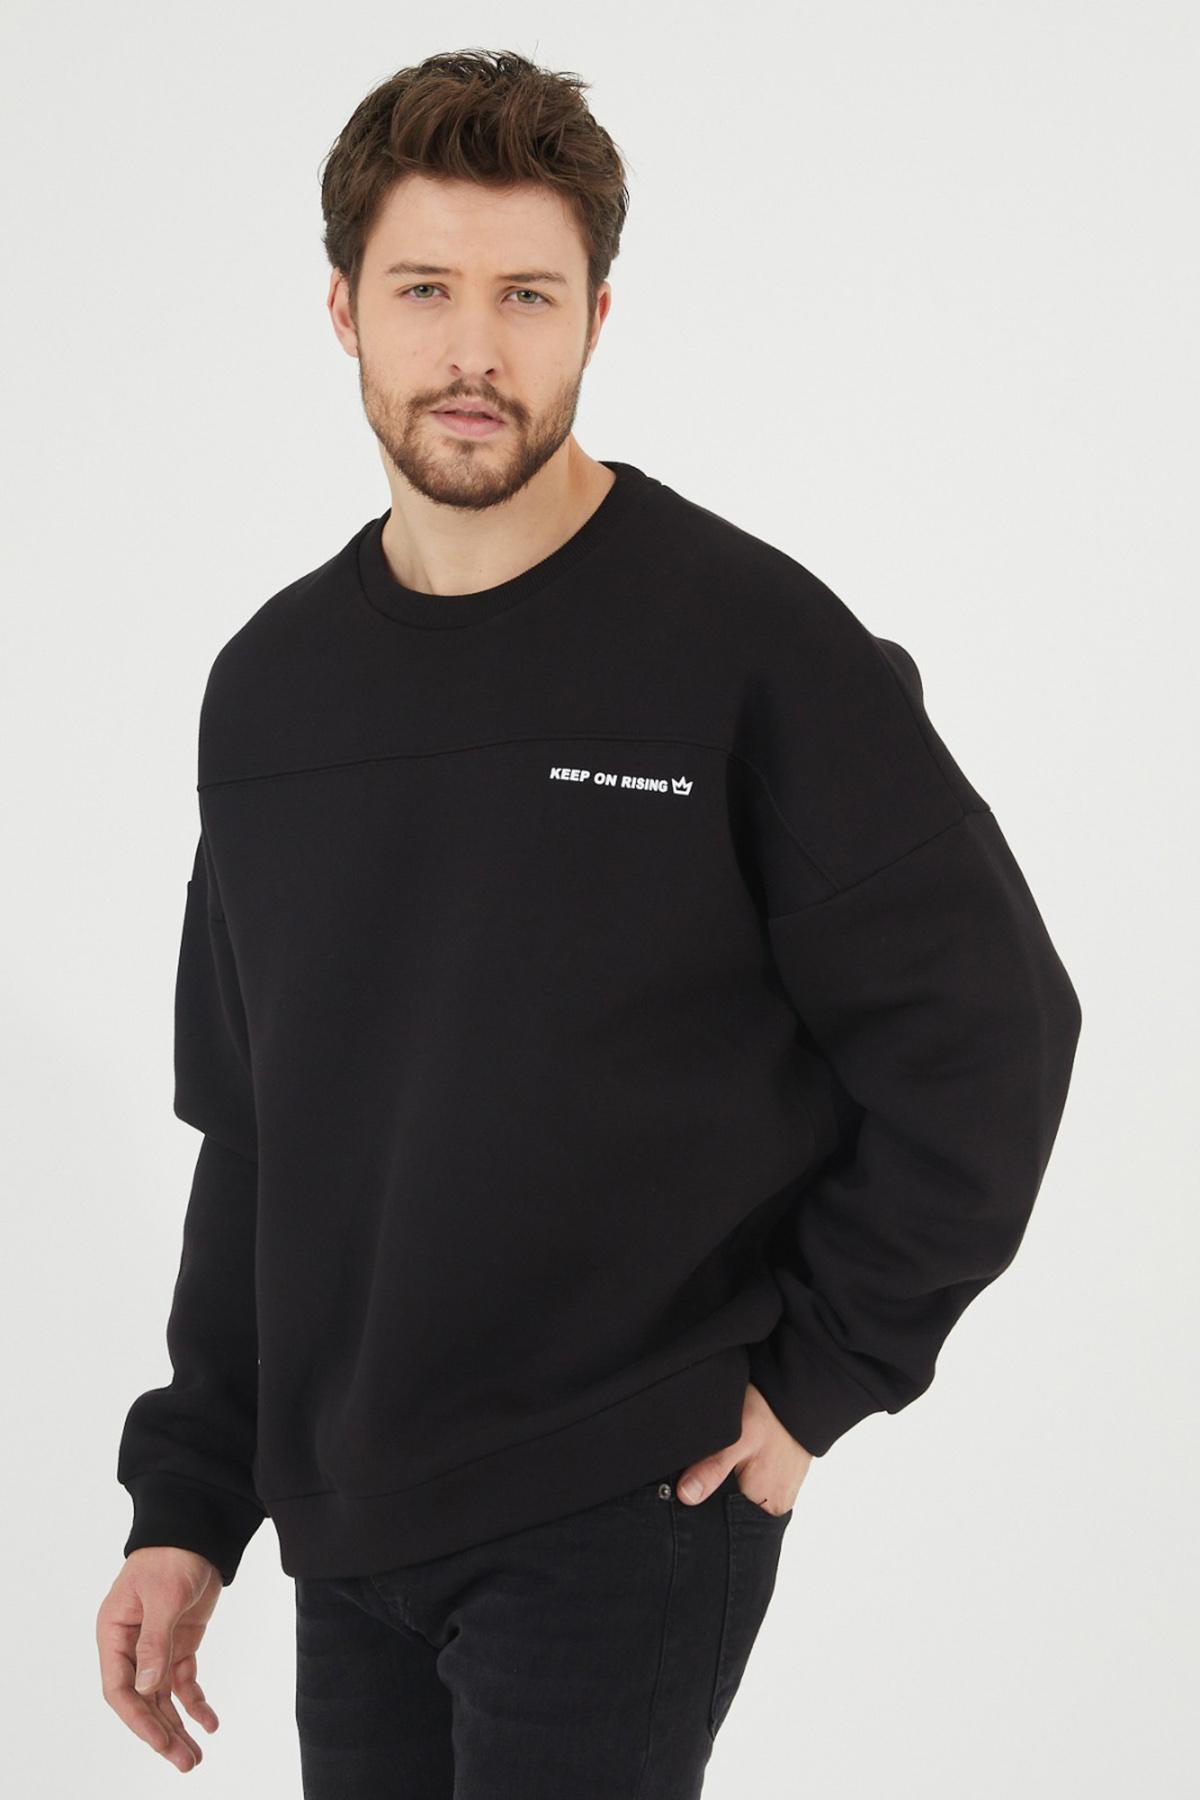 XHAN - Siyah Baskılı Sweatshirt 1KXE8-44447-02